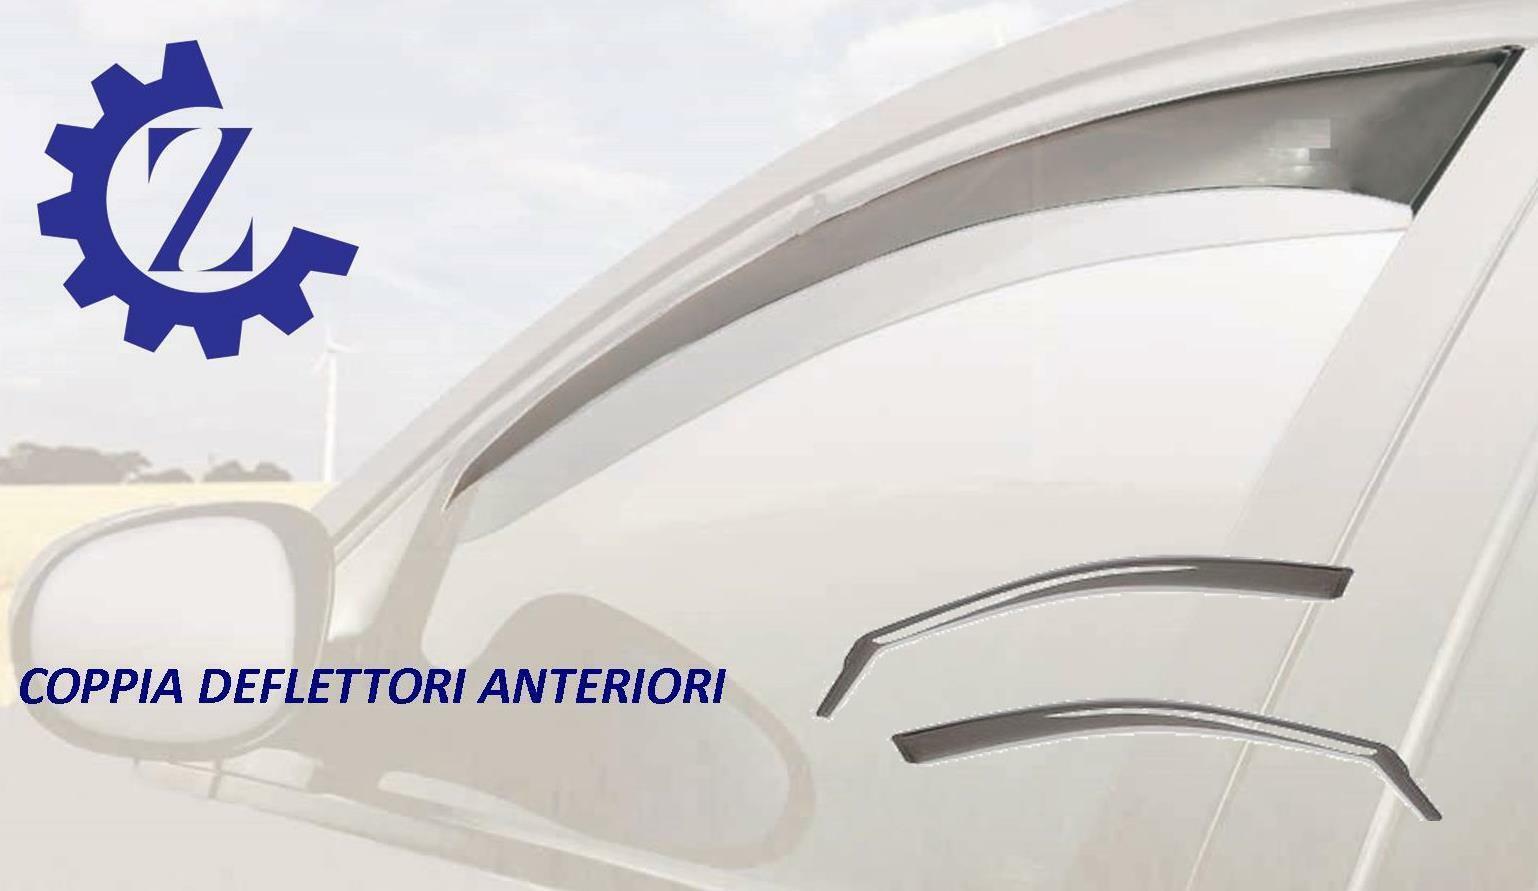 DEFLETTORI ARIA ANTITURBO PER FORD FIESTA 89 95 3 PORTE